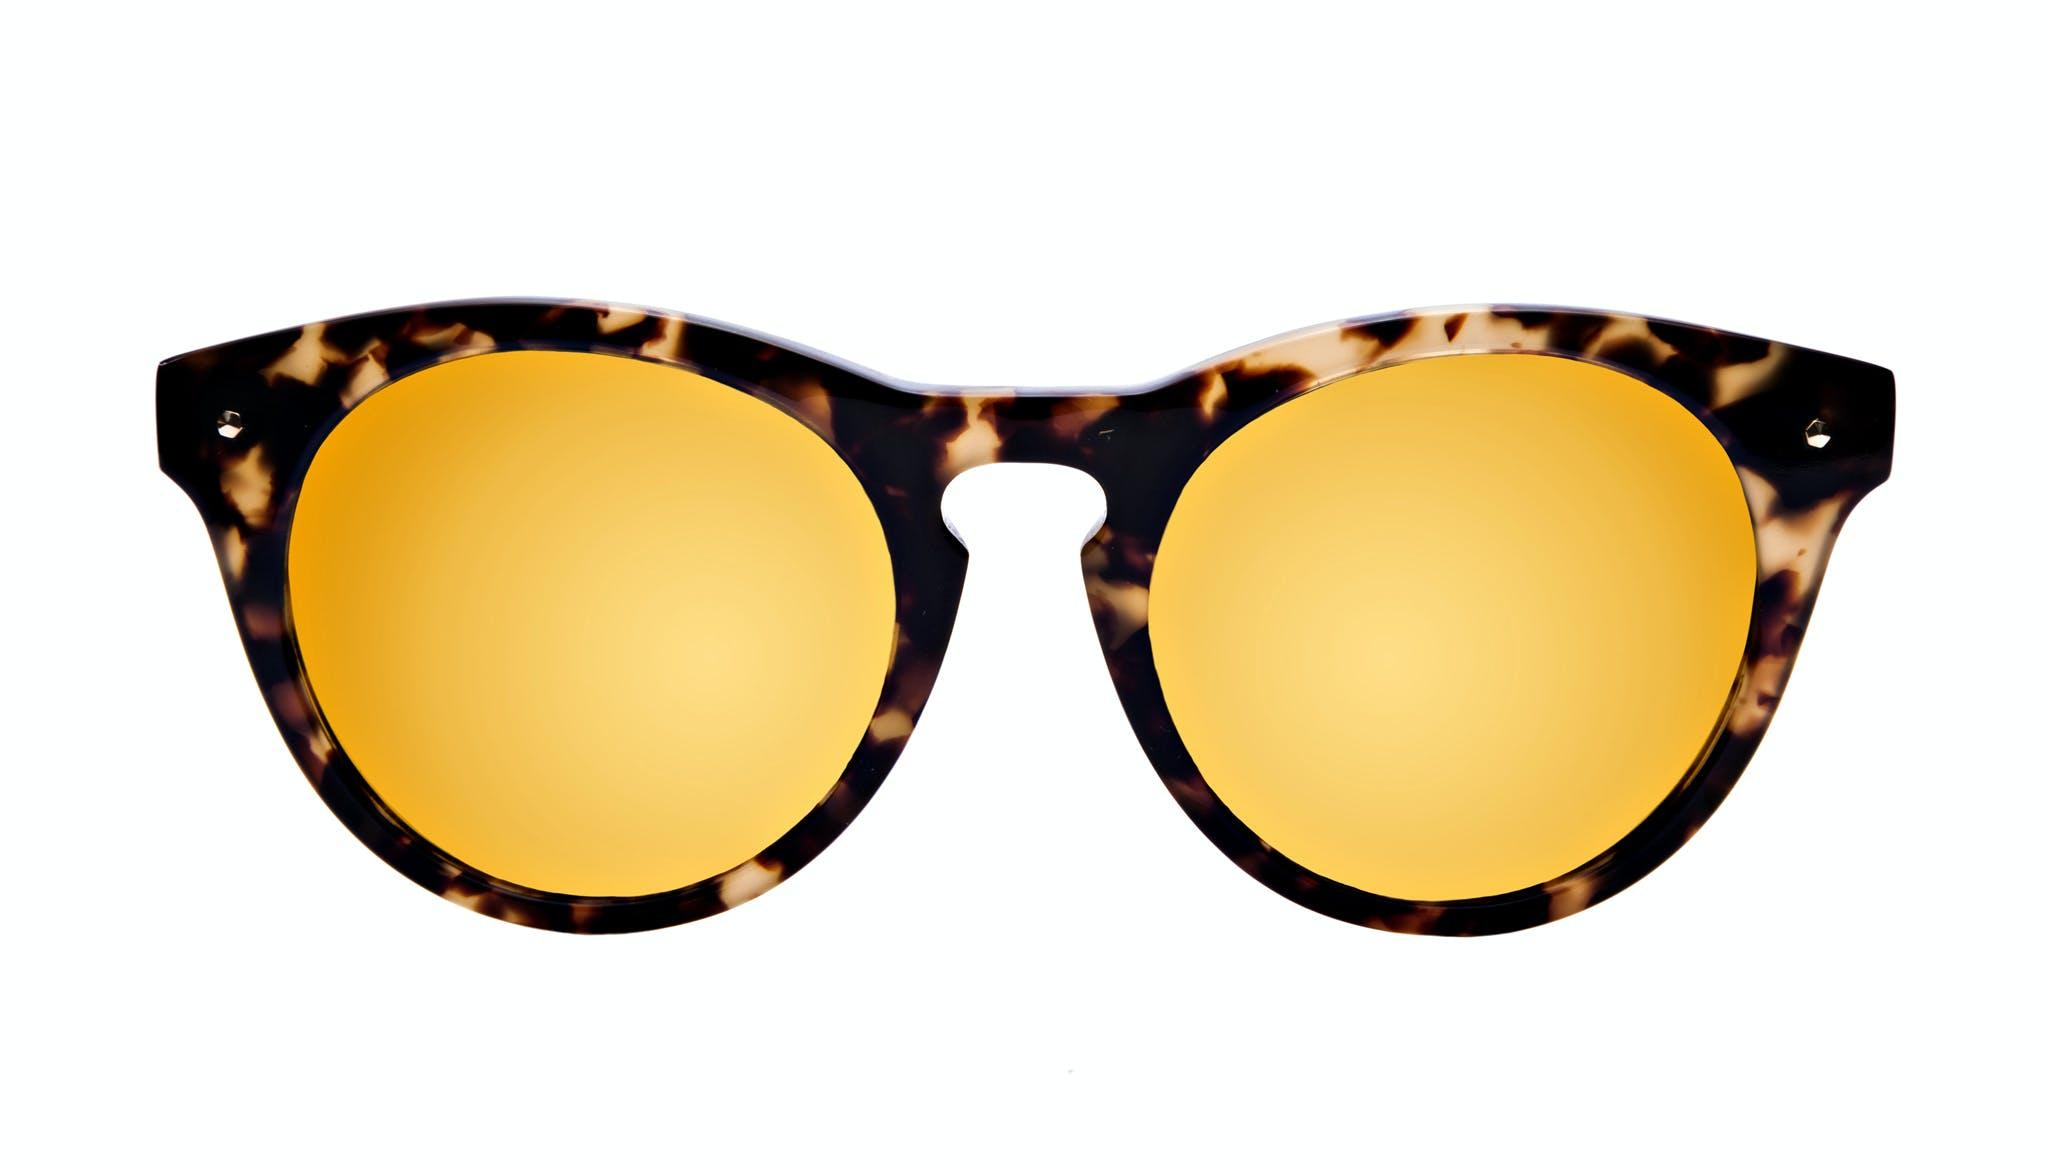 Affordable Fashion Glasses Cat Eye Round Sunglasses Women Nola Bingal Front